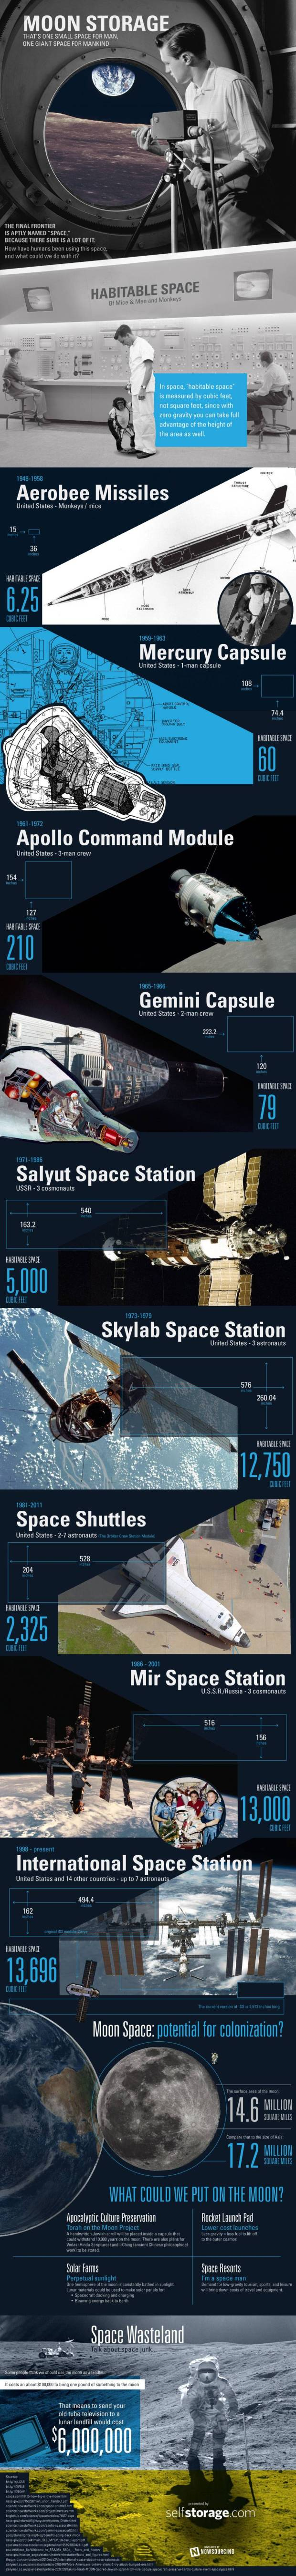 Moon Storage - IP